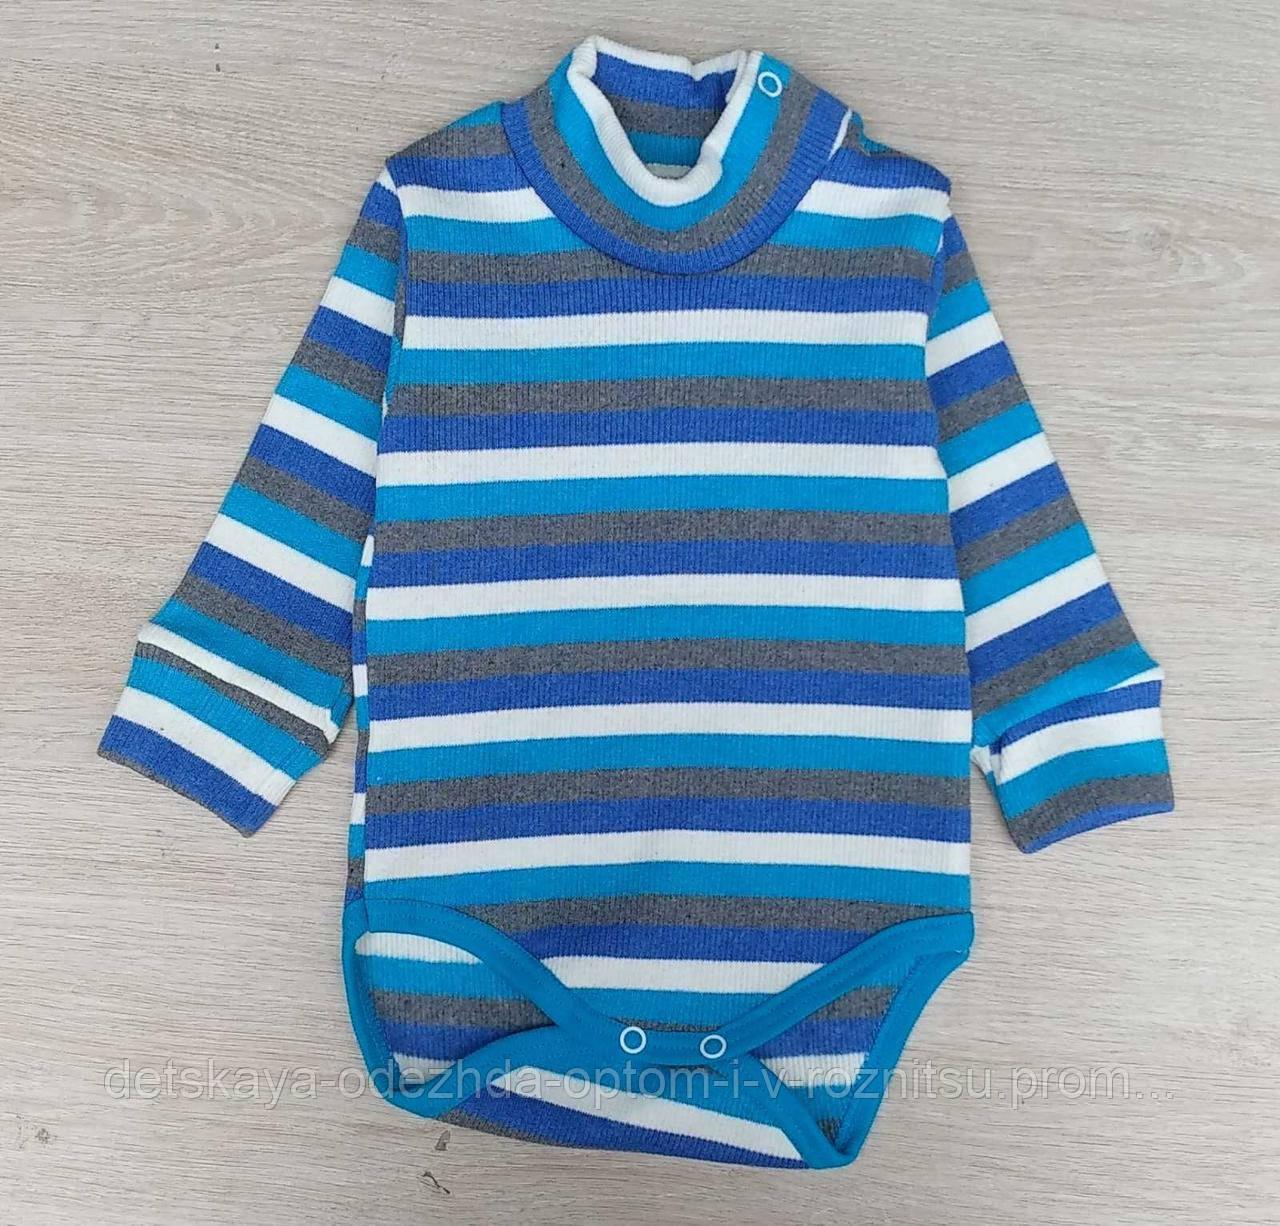 Бодик детский,22-28 размеры, кашкорсе, синий